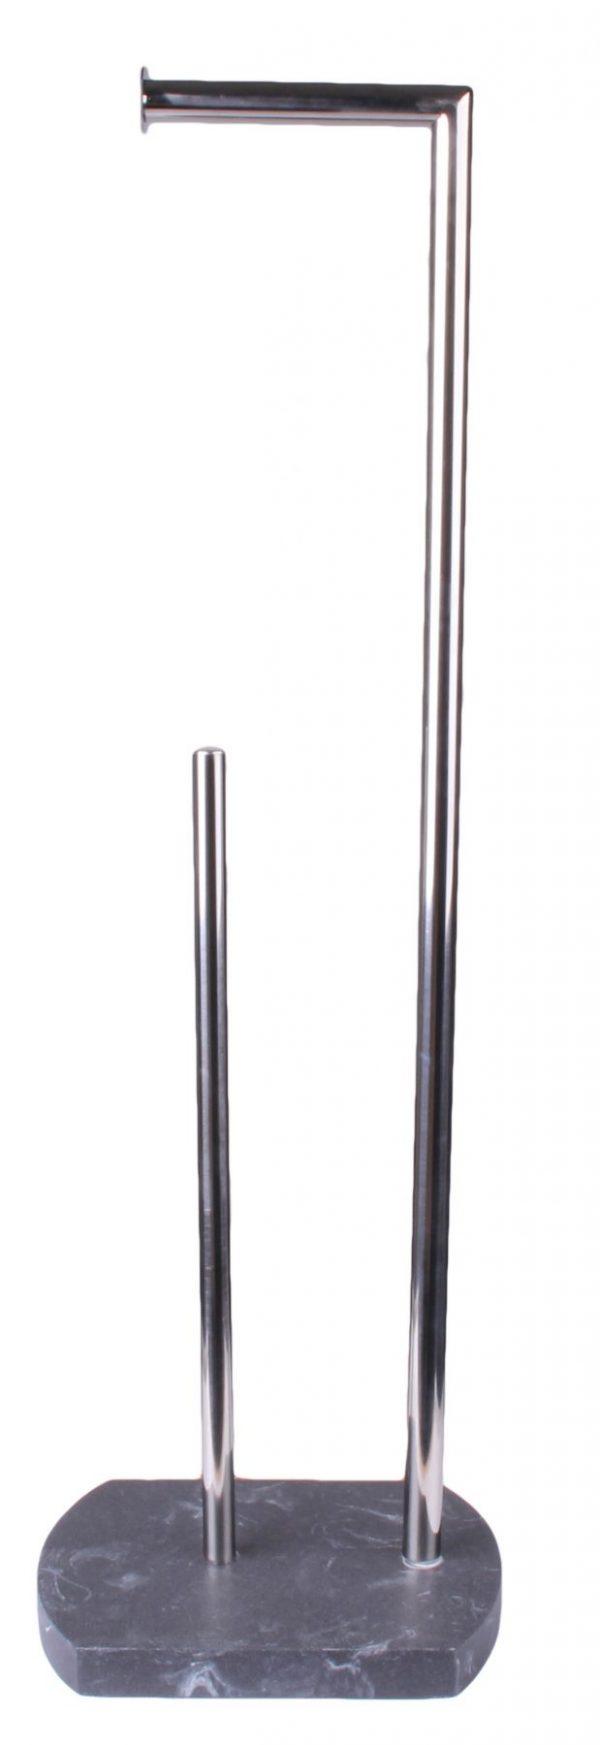 Octavia Freestanding Toilet Roll Holder & Spare – Grey